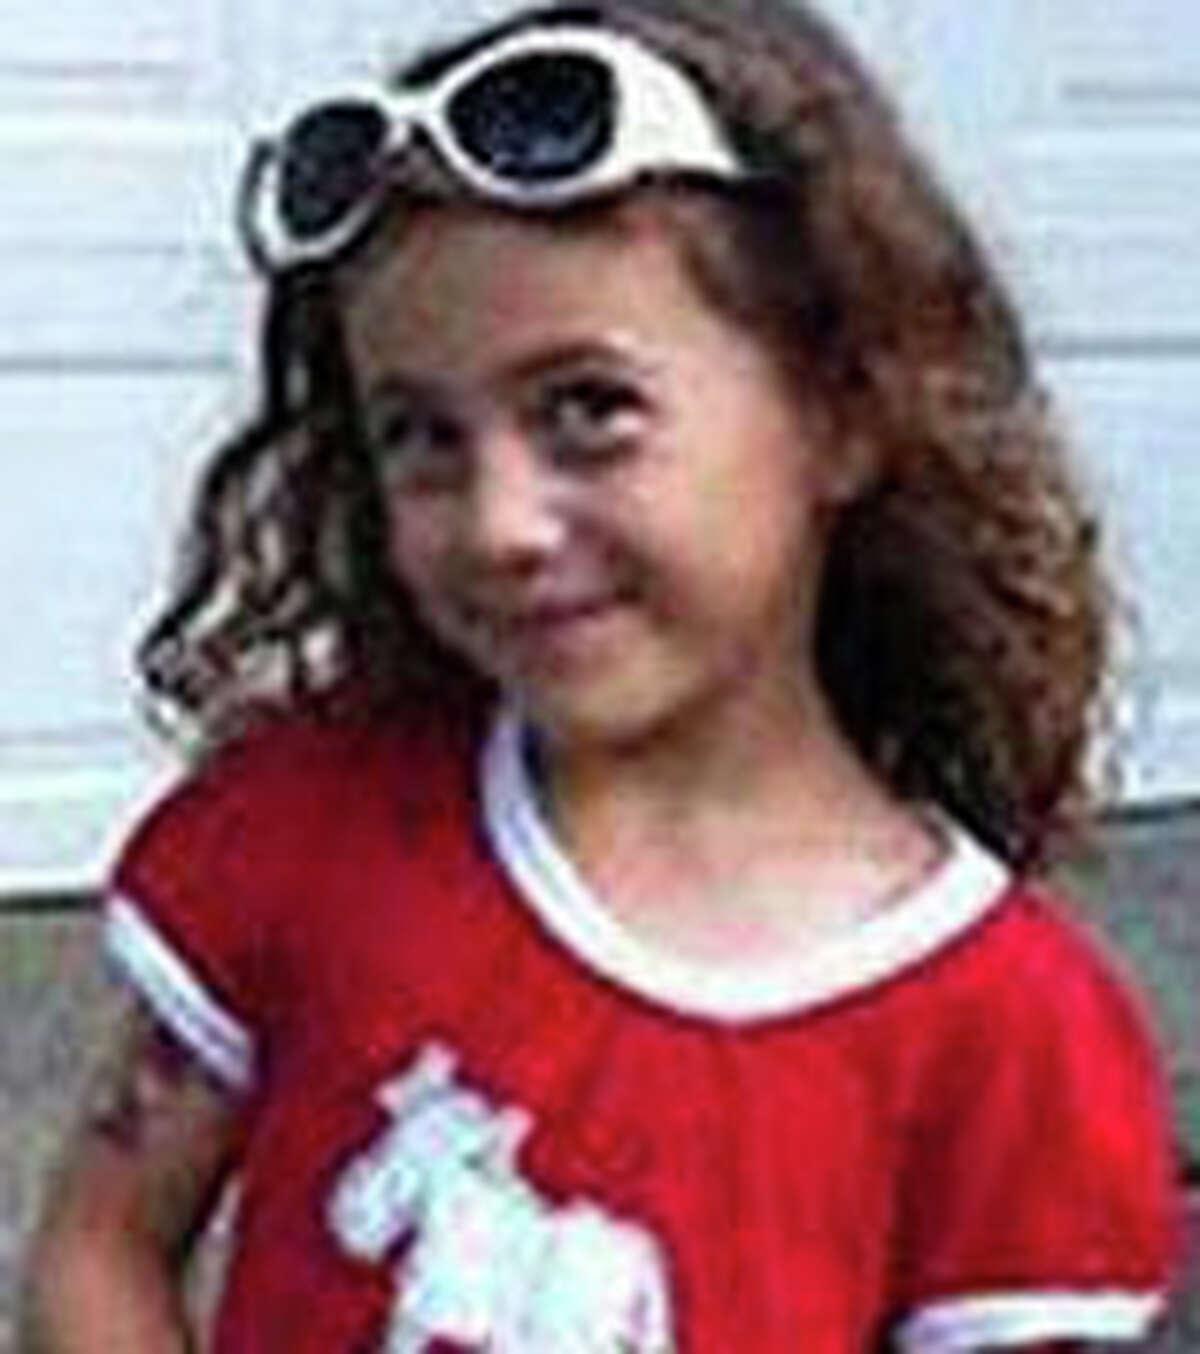 Avielle Richman died in the Sandy Hook Elementary School shooting in Newtown, Conn. on Friday, Dec. 14, 2012.